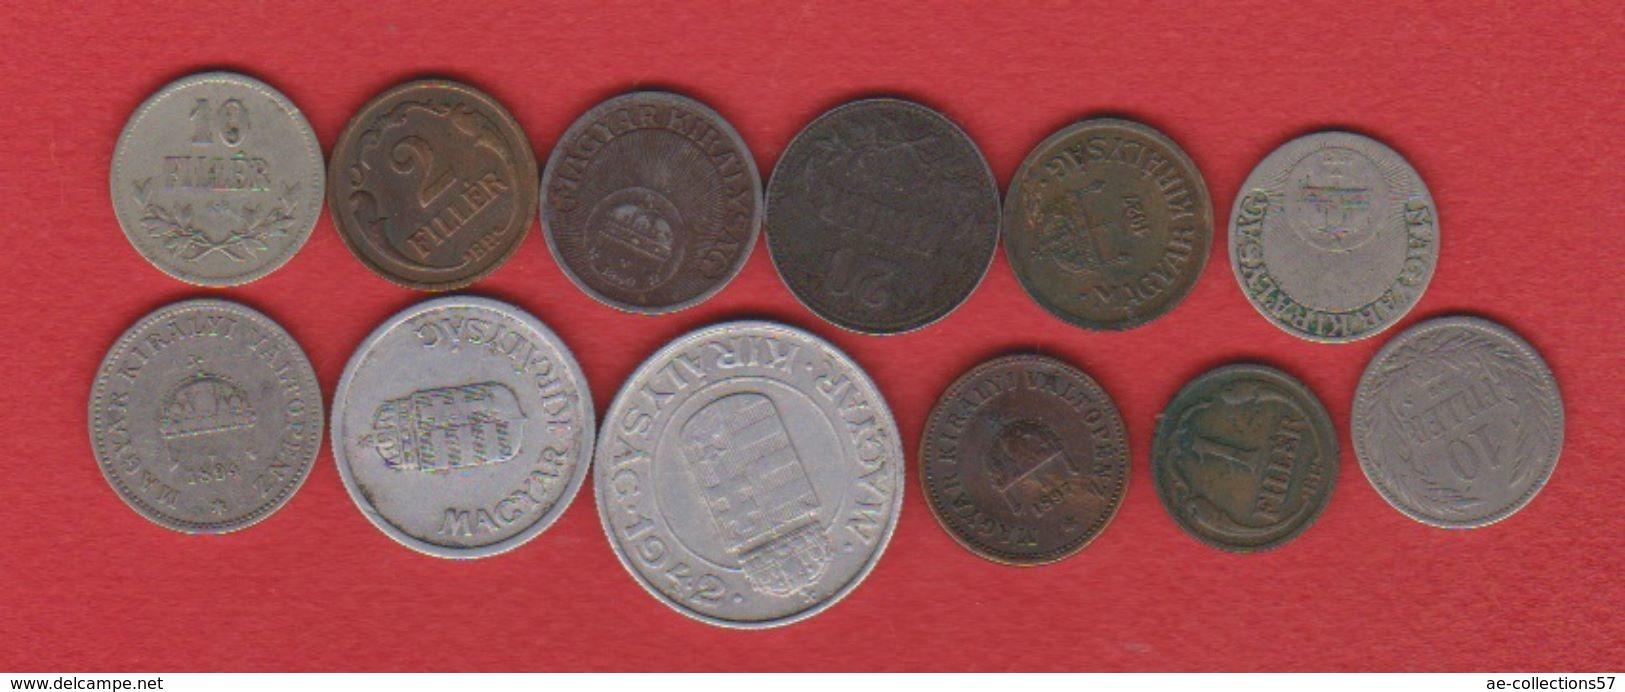 Hongrie / Lot De 12 Monnaies - Hungary